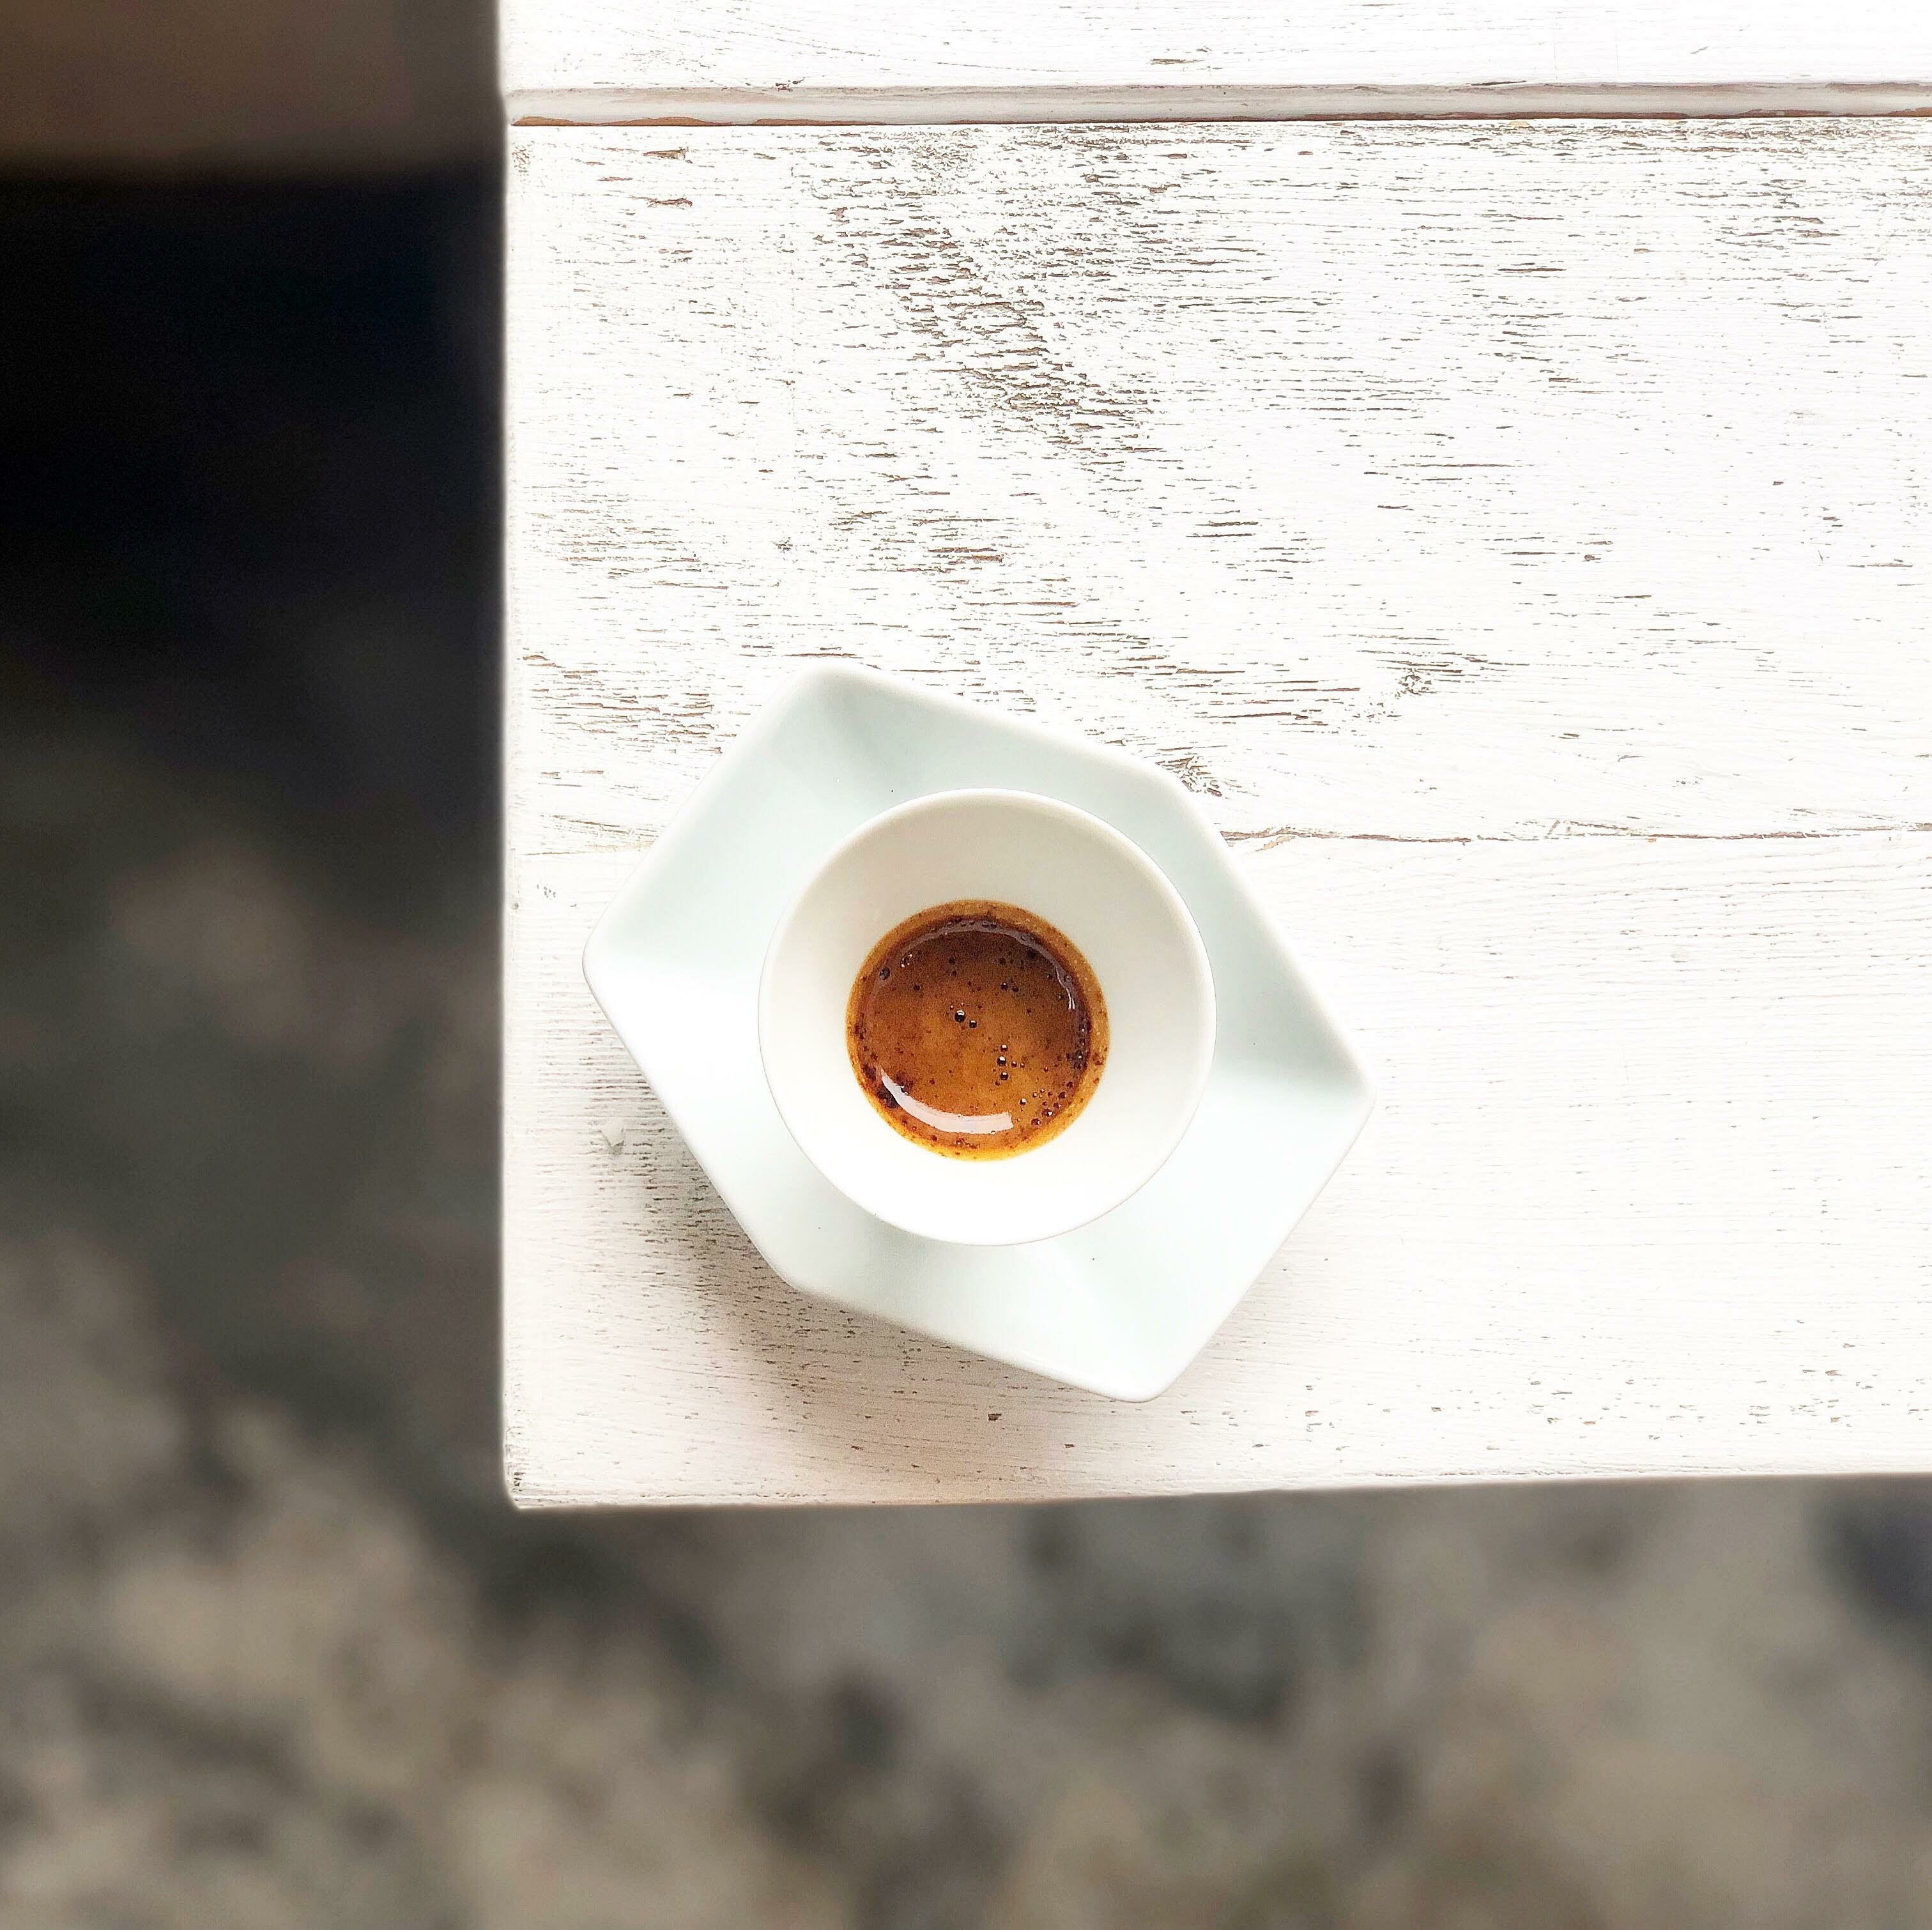 Espresso seminar beginner course 9/21(土)